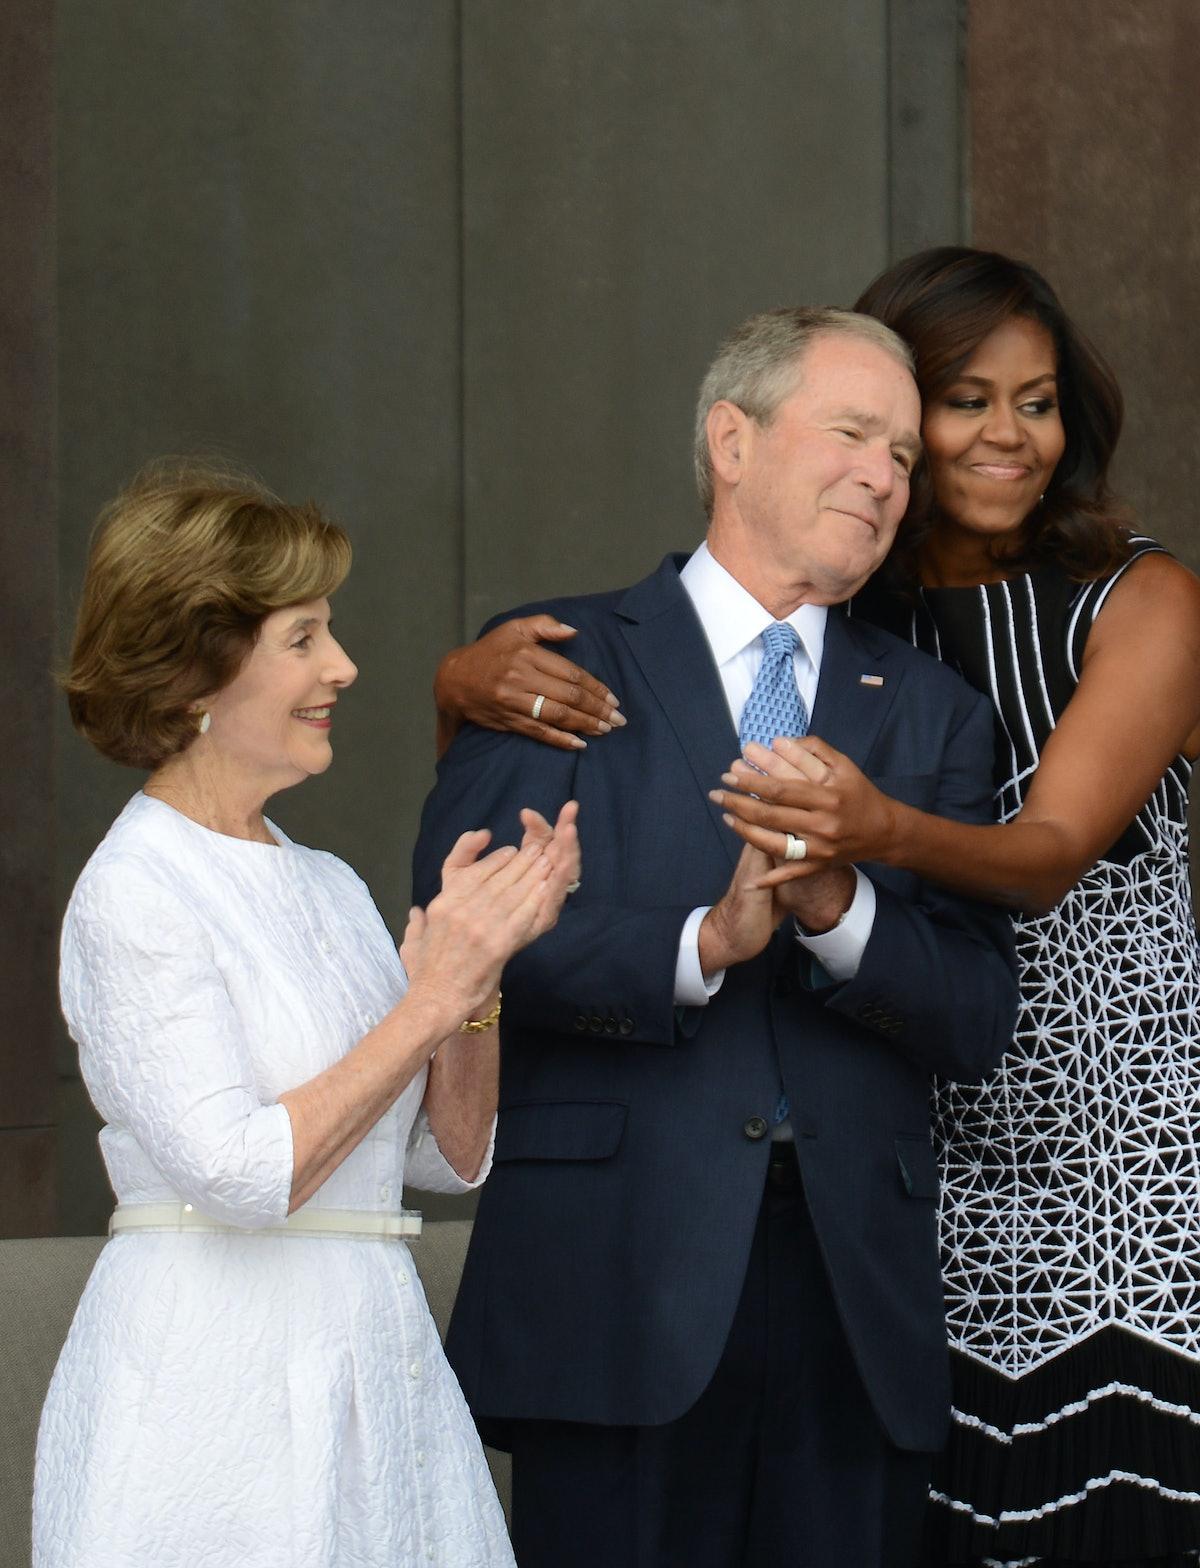 Michelle Obama Explains That George & Laura Bush Moment At John McCain's Funeral